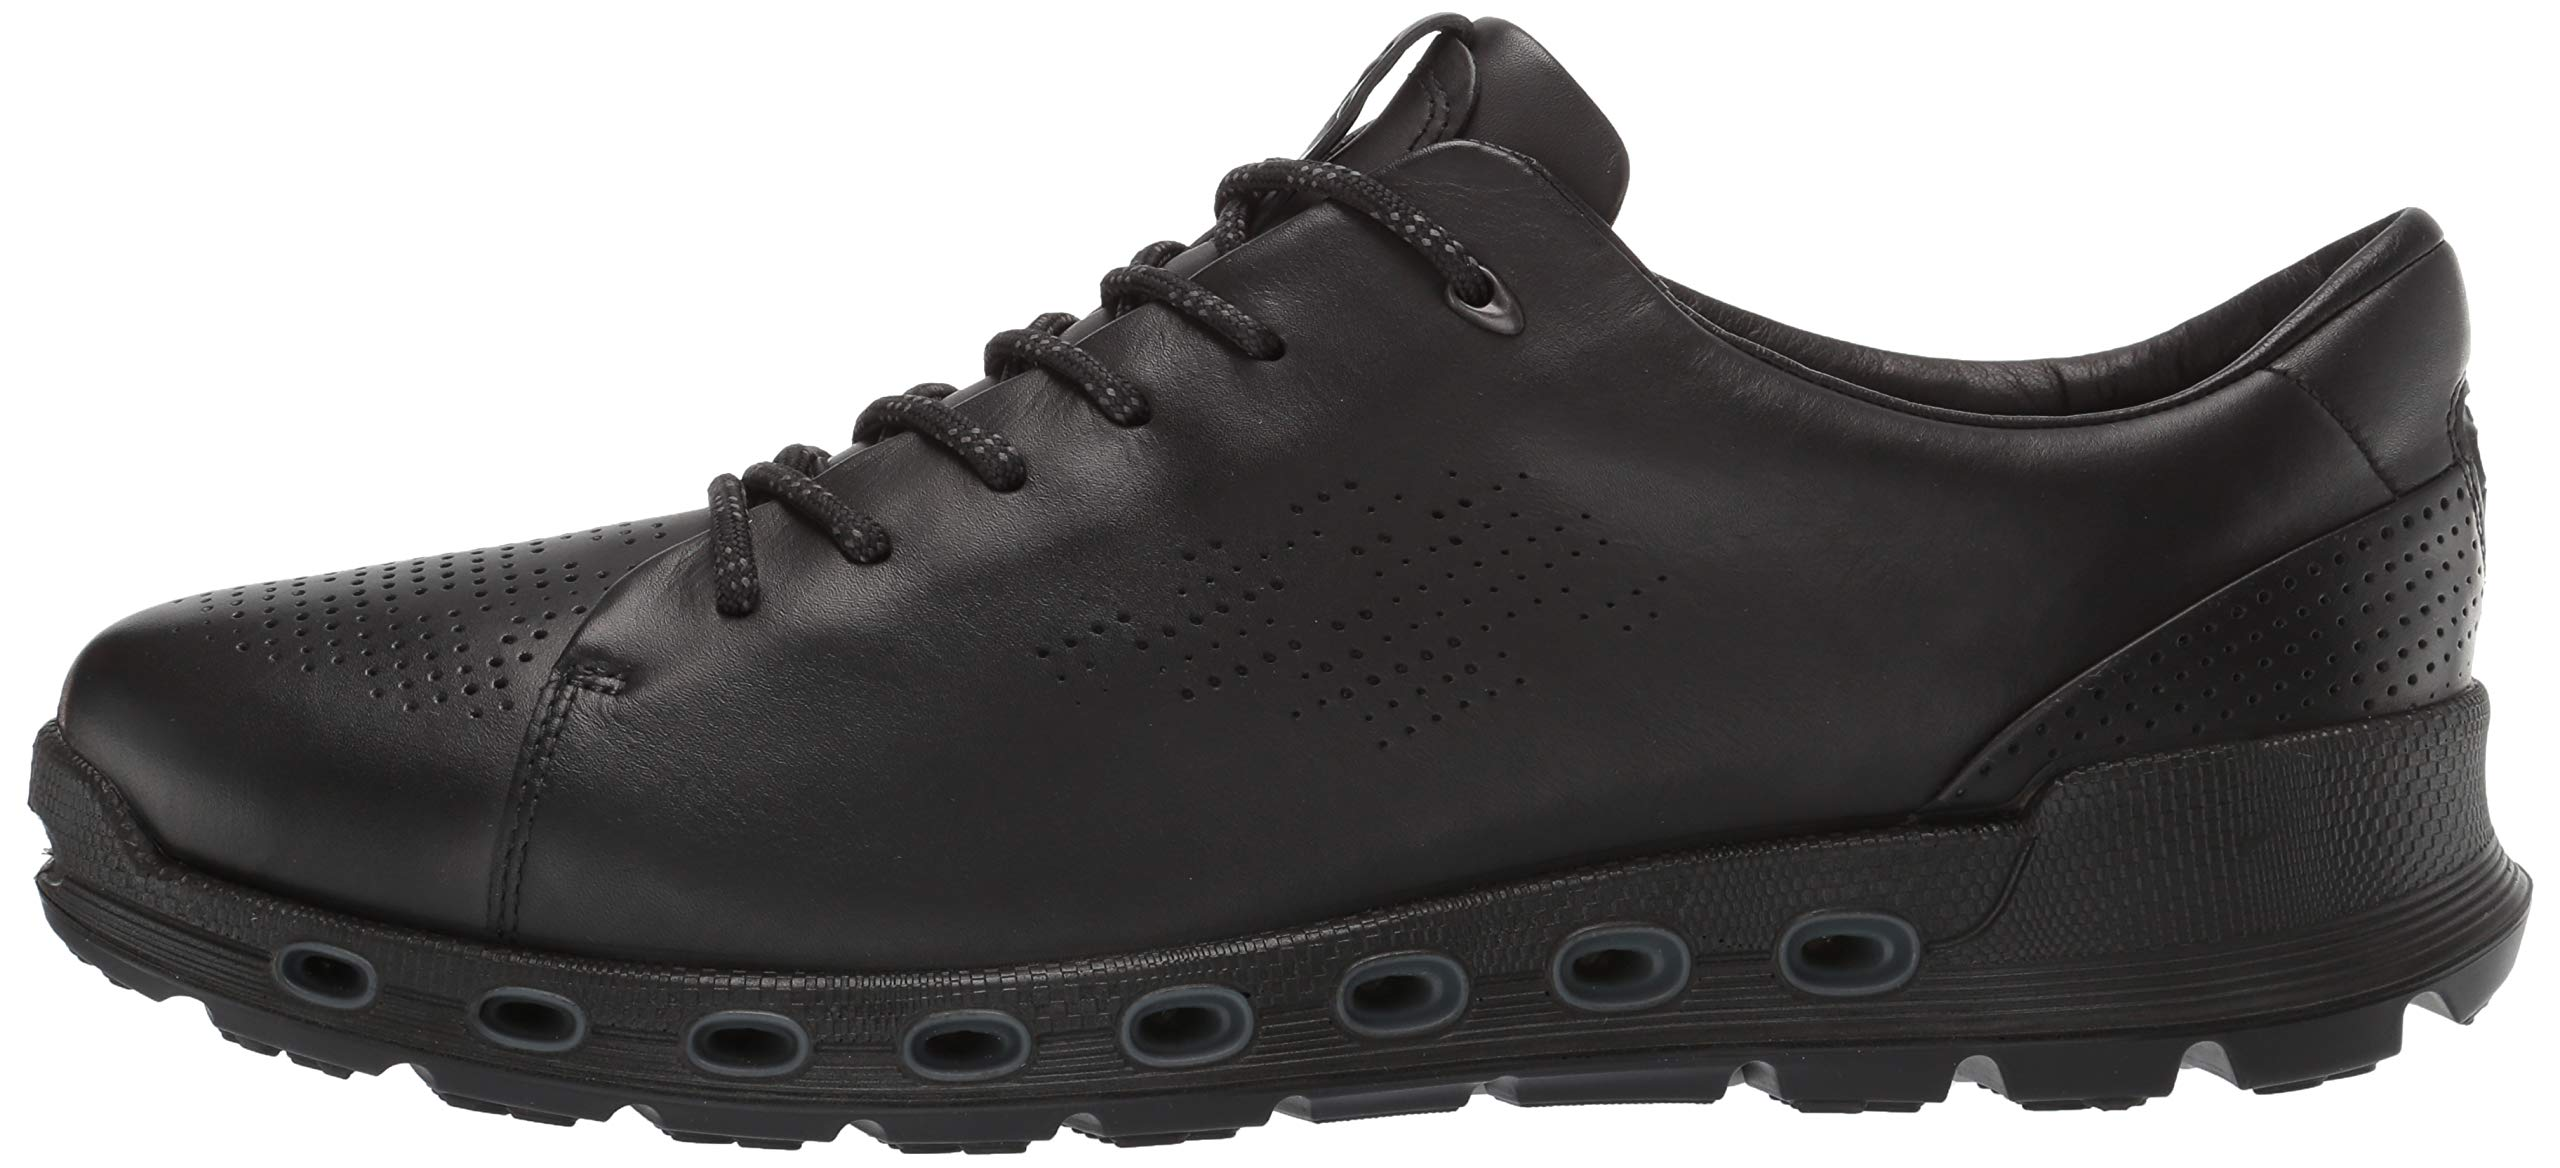 Ecco Men's Cool 2.0 Leather Gore-tex